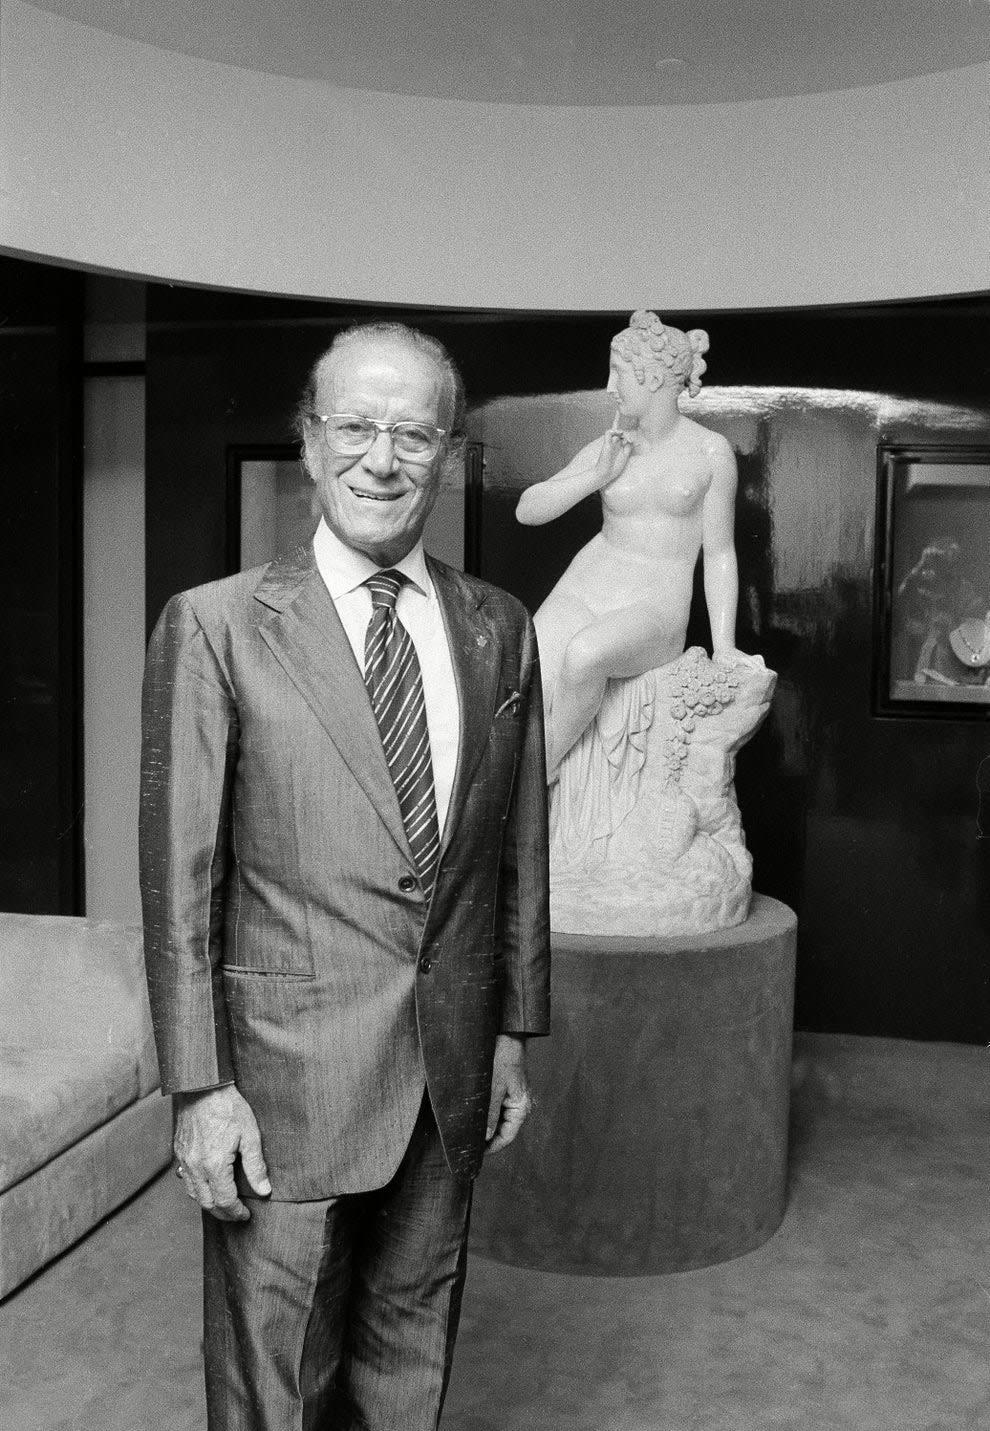 Aldo Gucci standing in front a statue